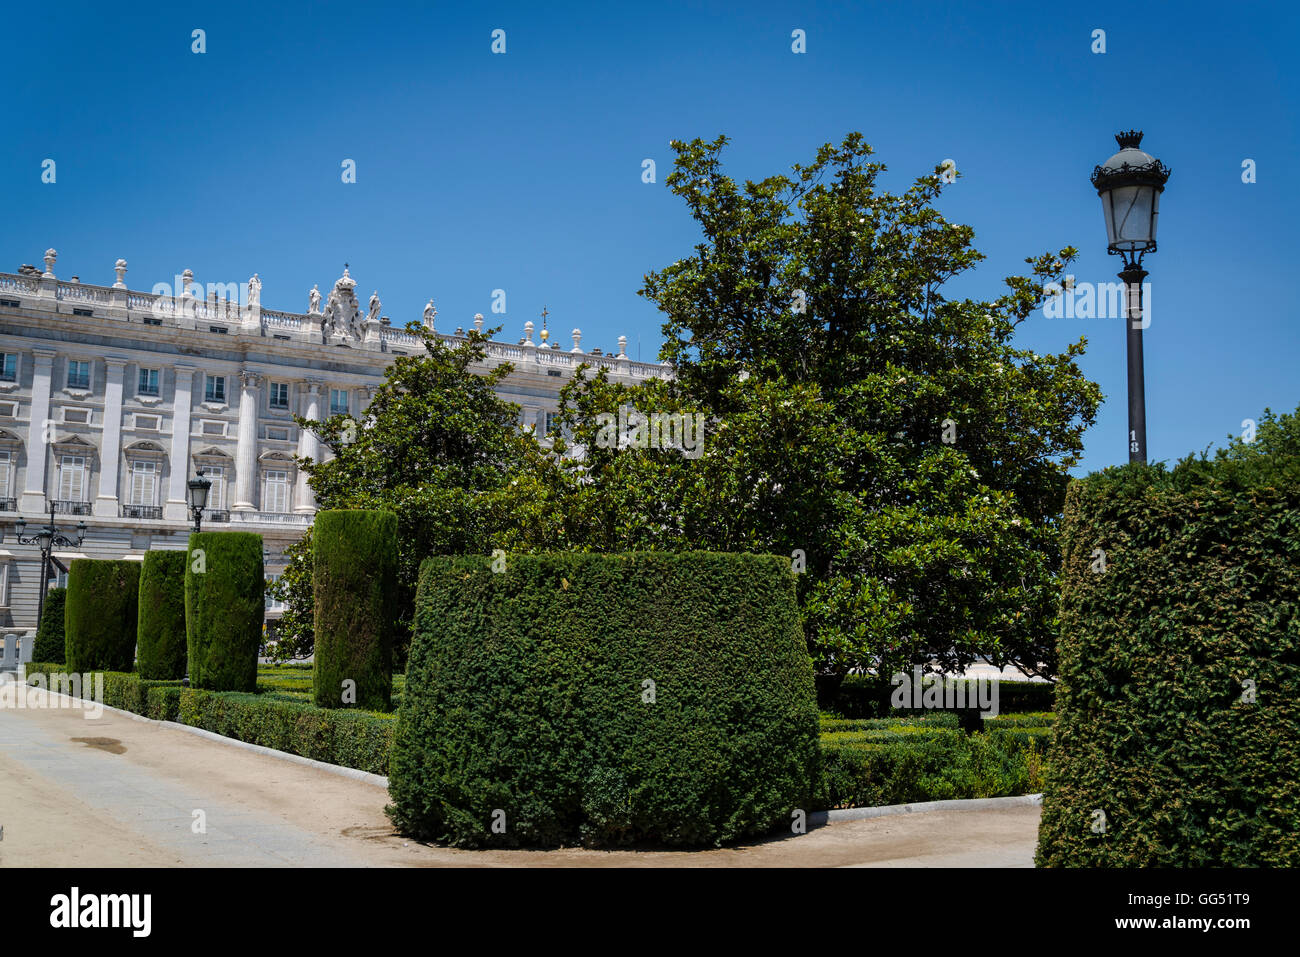 Plaza de Oriente with the topiaries of the Baroque garden, Madrid, Spain - Stock Image